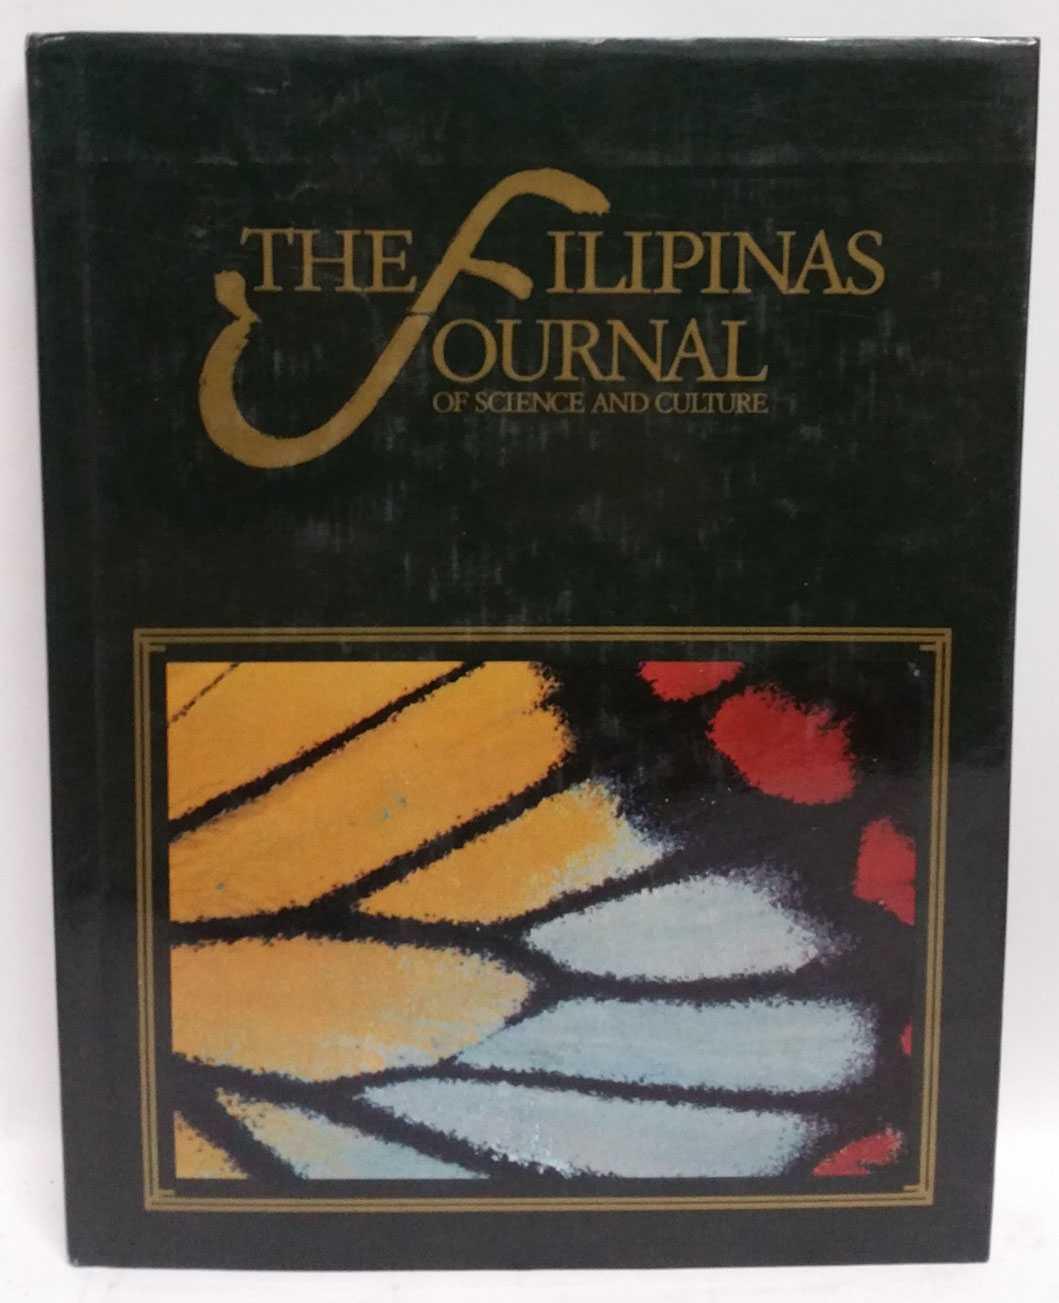 The Filipinas Journal of Science and Culture (Volume 5), Monina Allarey Mercado